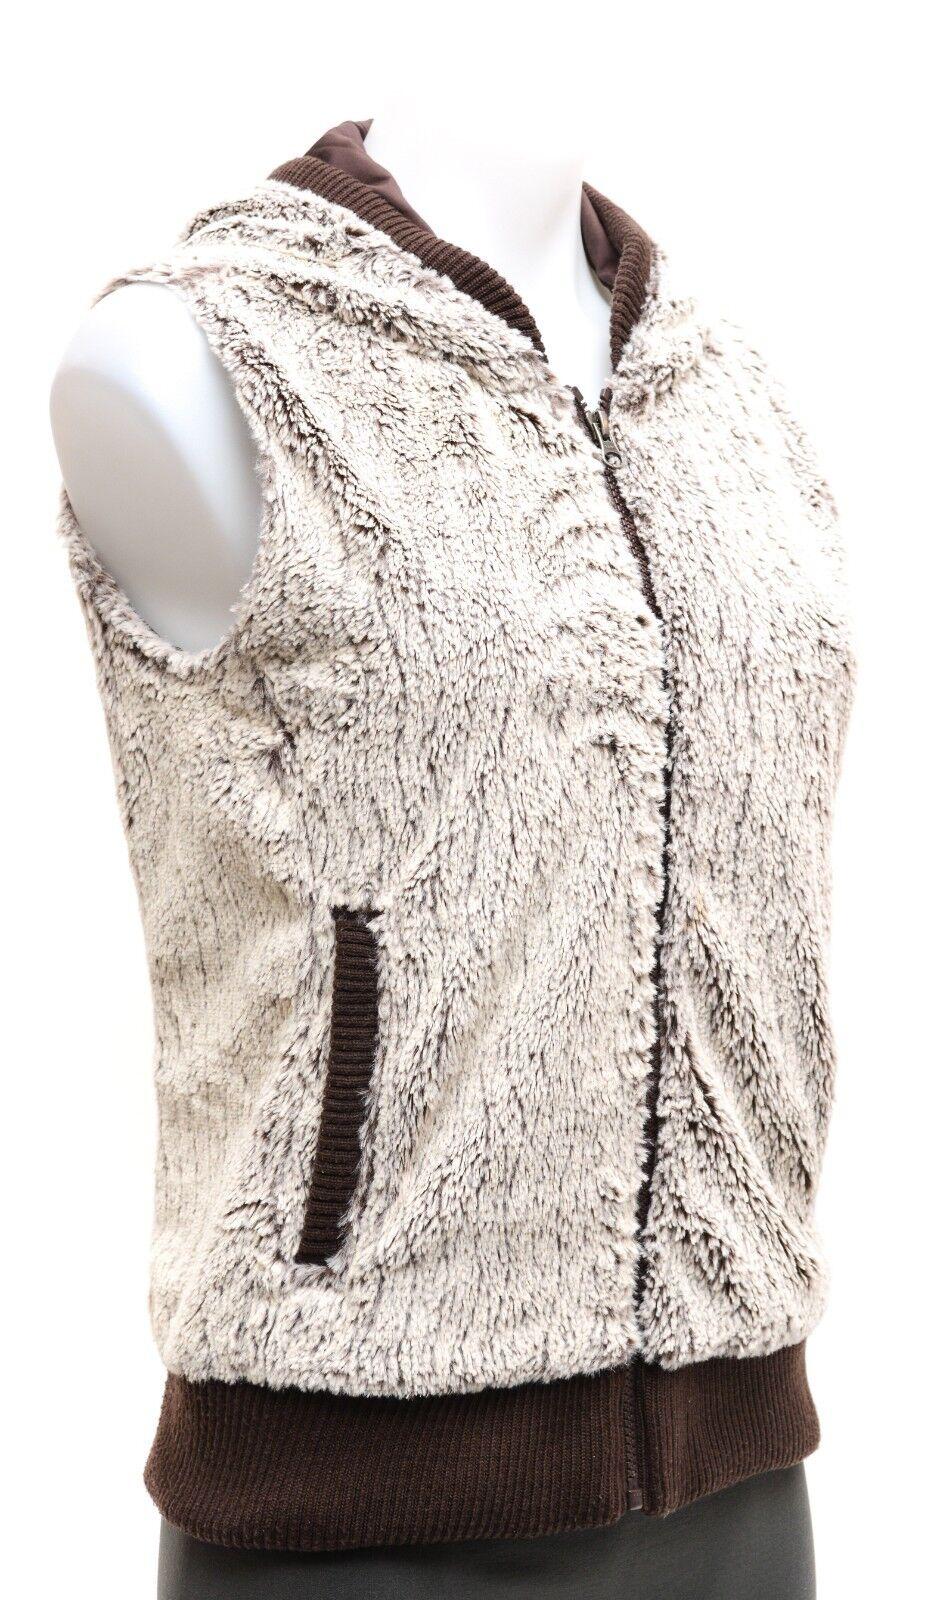 Patagonia Women's Conejo Hooded Fleece Vest XS Java Brown Casual Ski Fashion